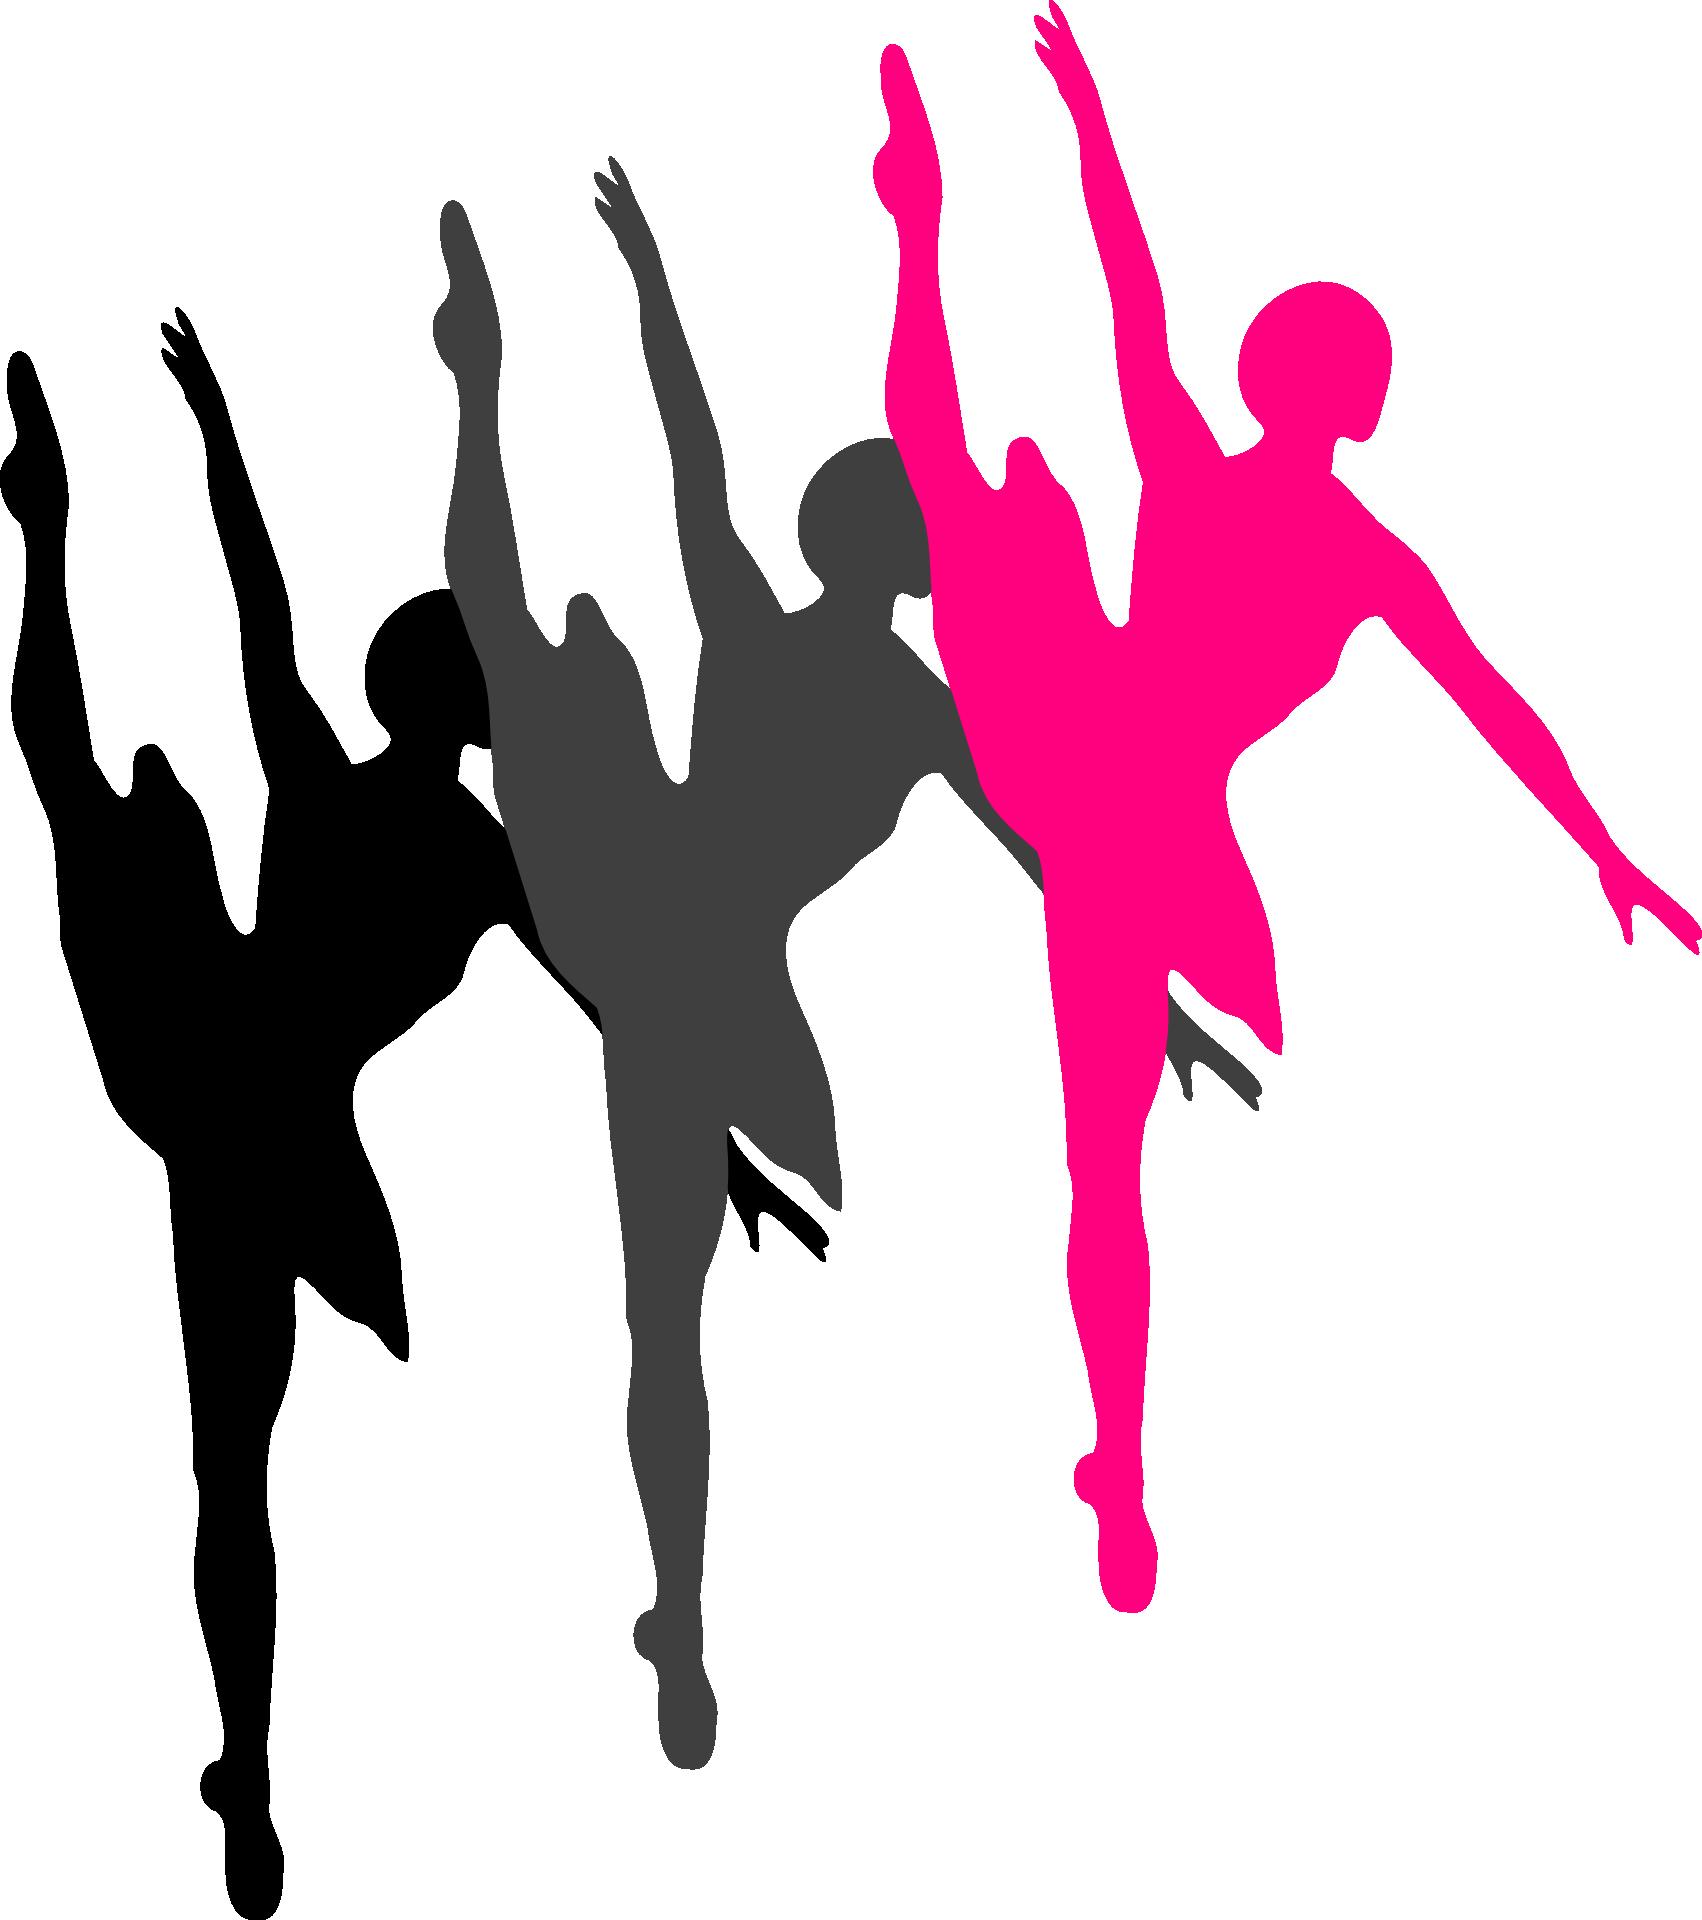 Irish silhouette at getdrawings. Dancer clipart high kick